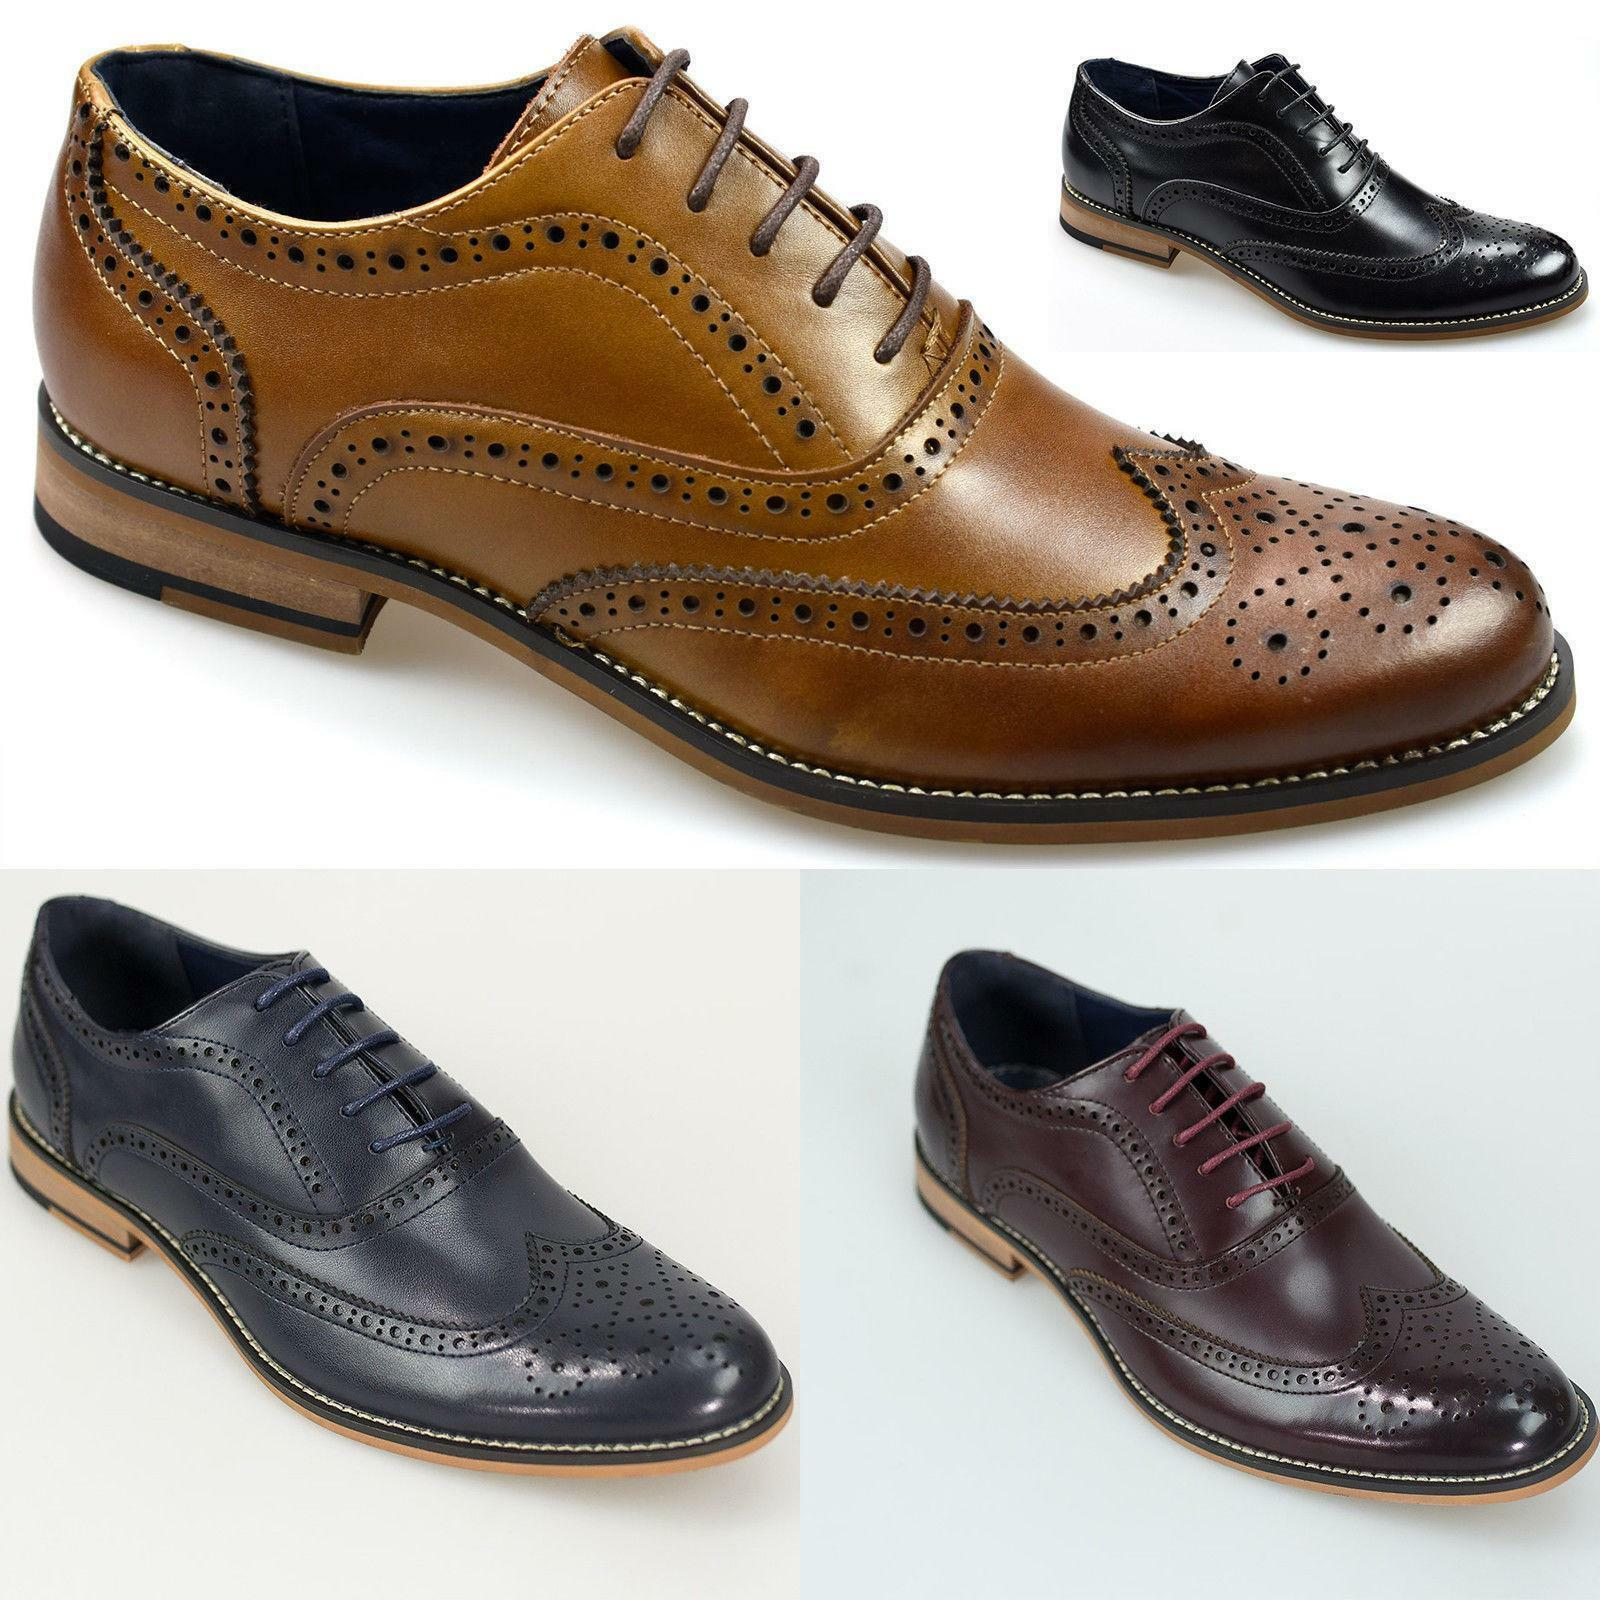 Cavani Mens Leather Brogue shoes Oxford Lace Up Peaky Blinders, Office, Weddings